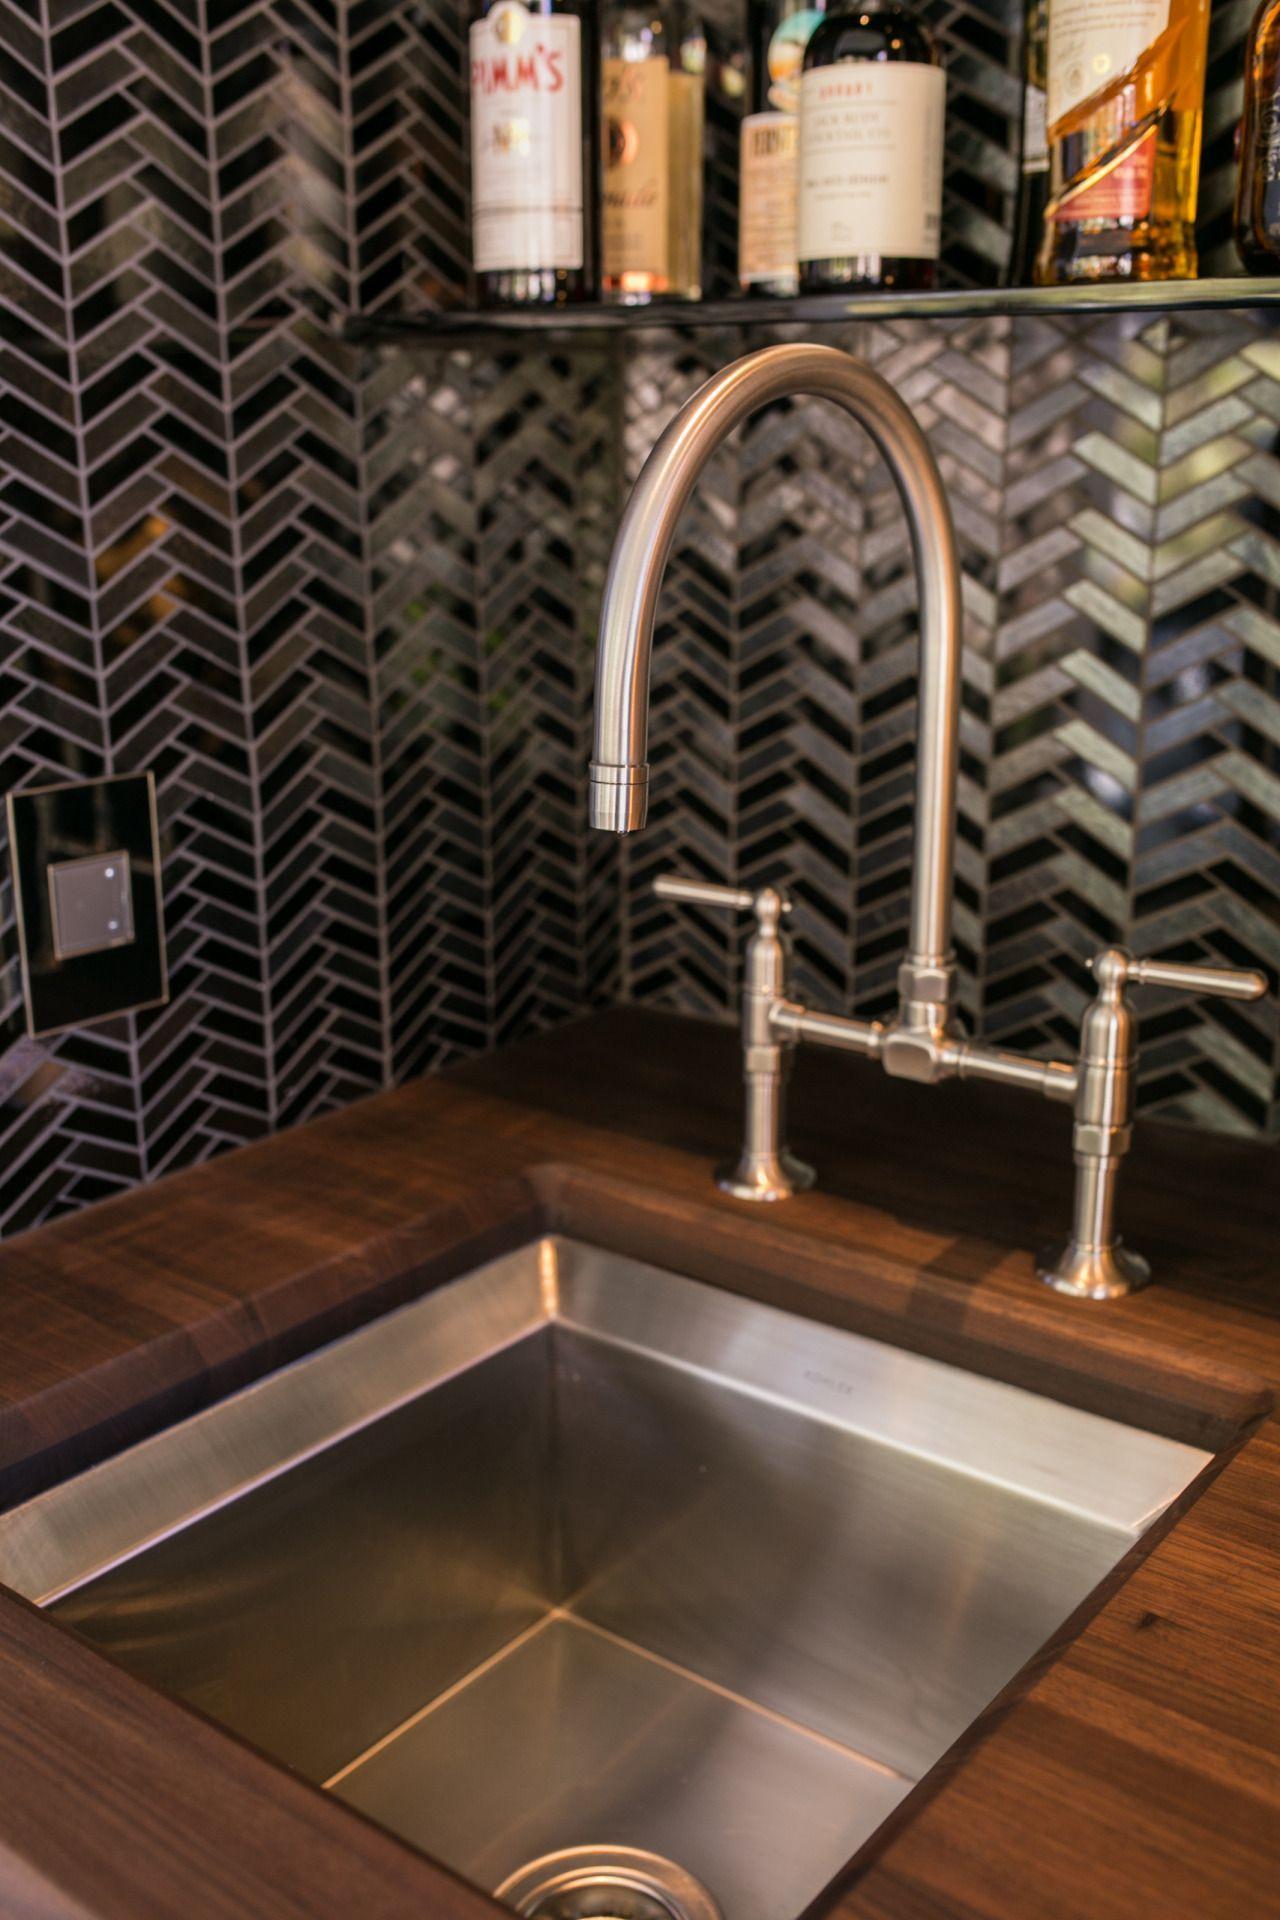 Kohler Bar Sink Dimensions With Undermouth Design Idea Stainless Steel Modern Design Kitchenfaucetdim Kitchen Faucet Elegant Kitchens House Beautiful Kitchens